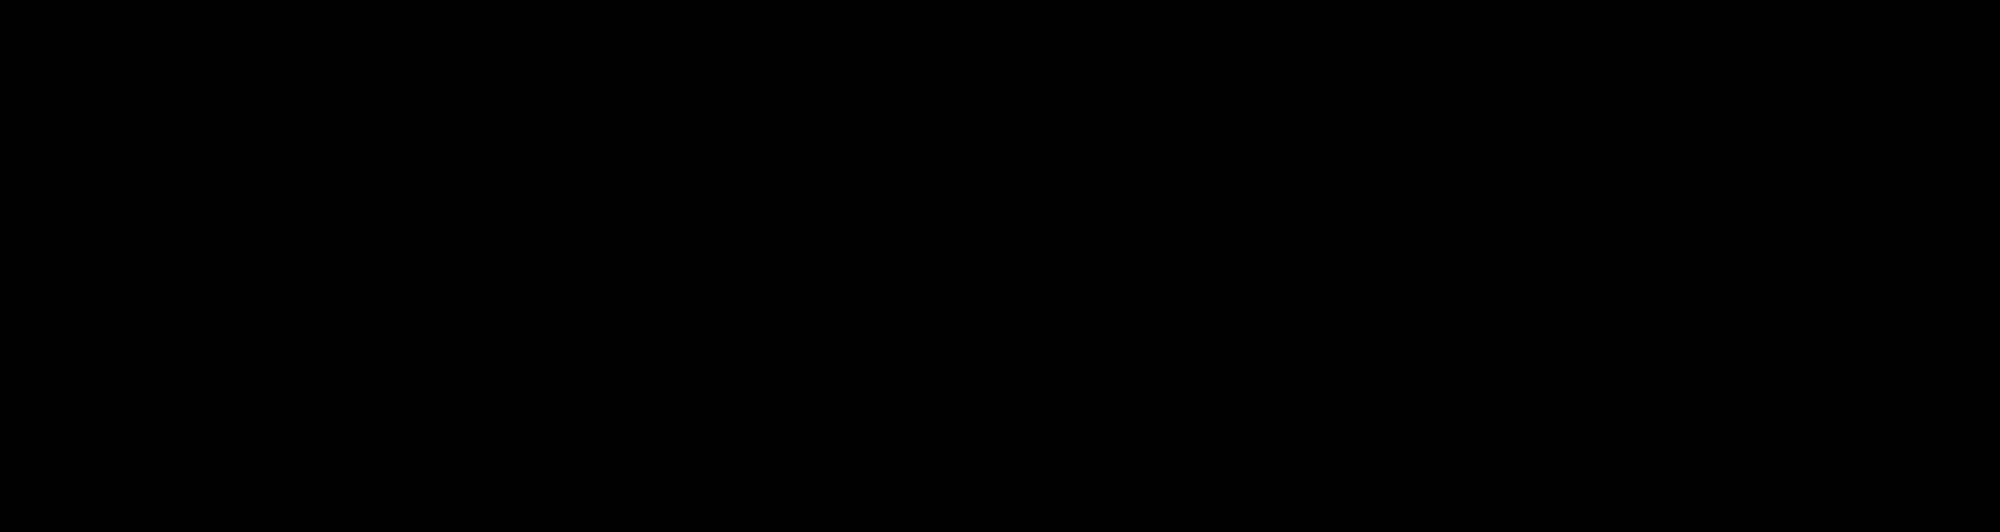 eekly schedule-logo (1).png